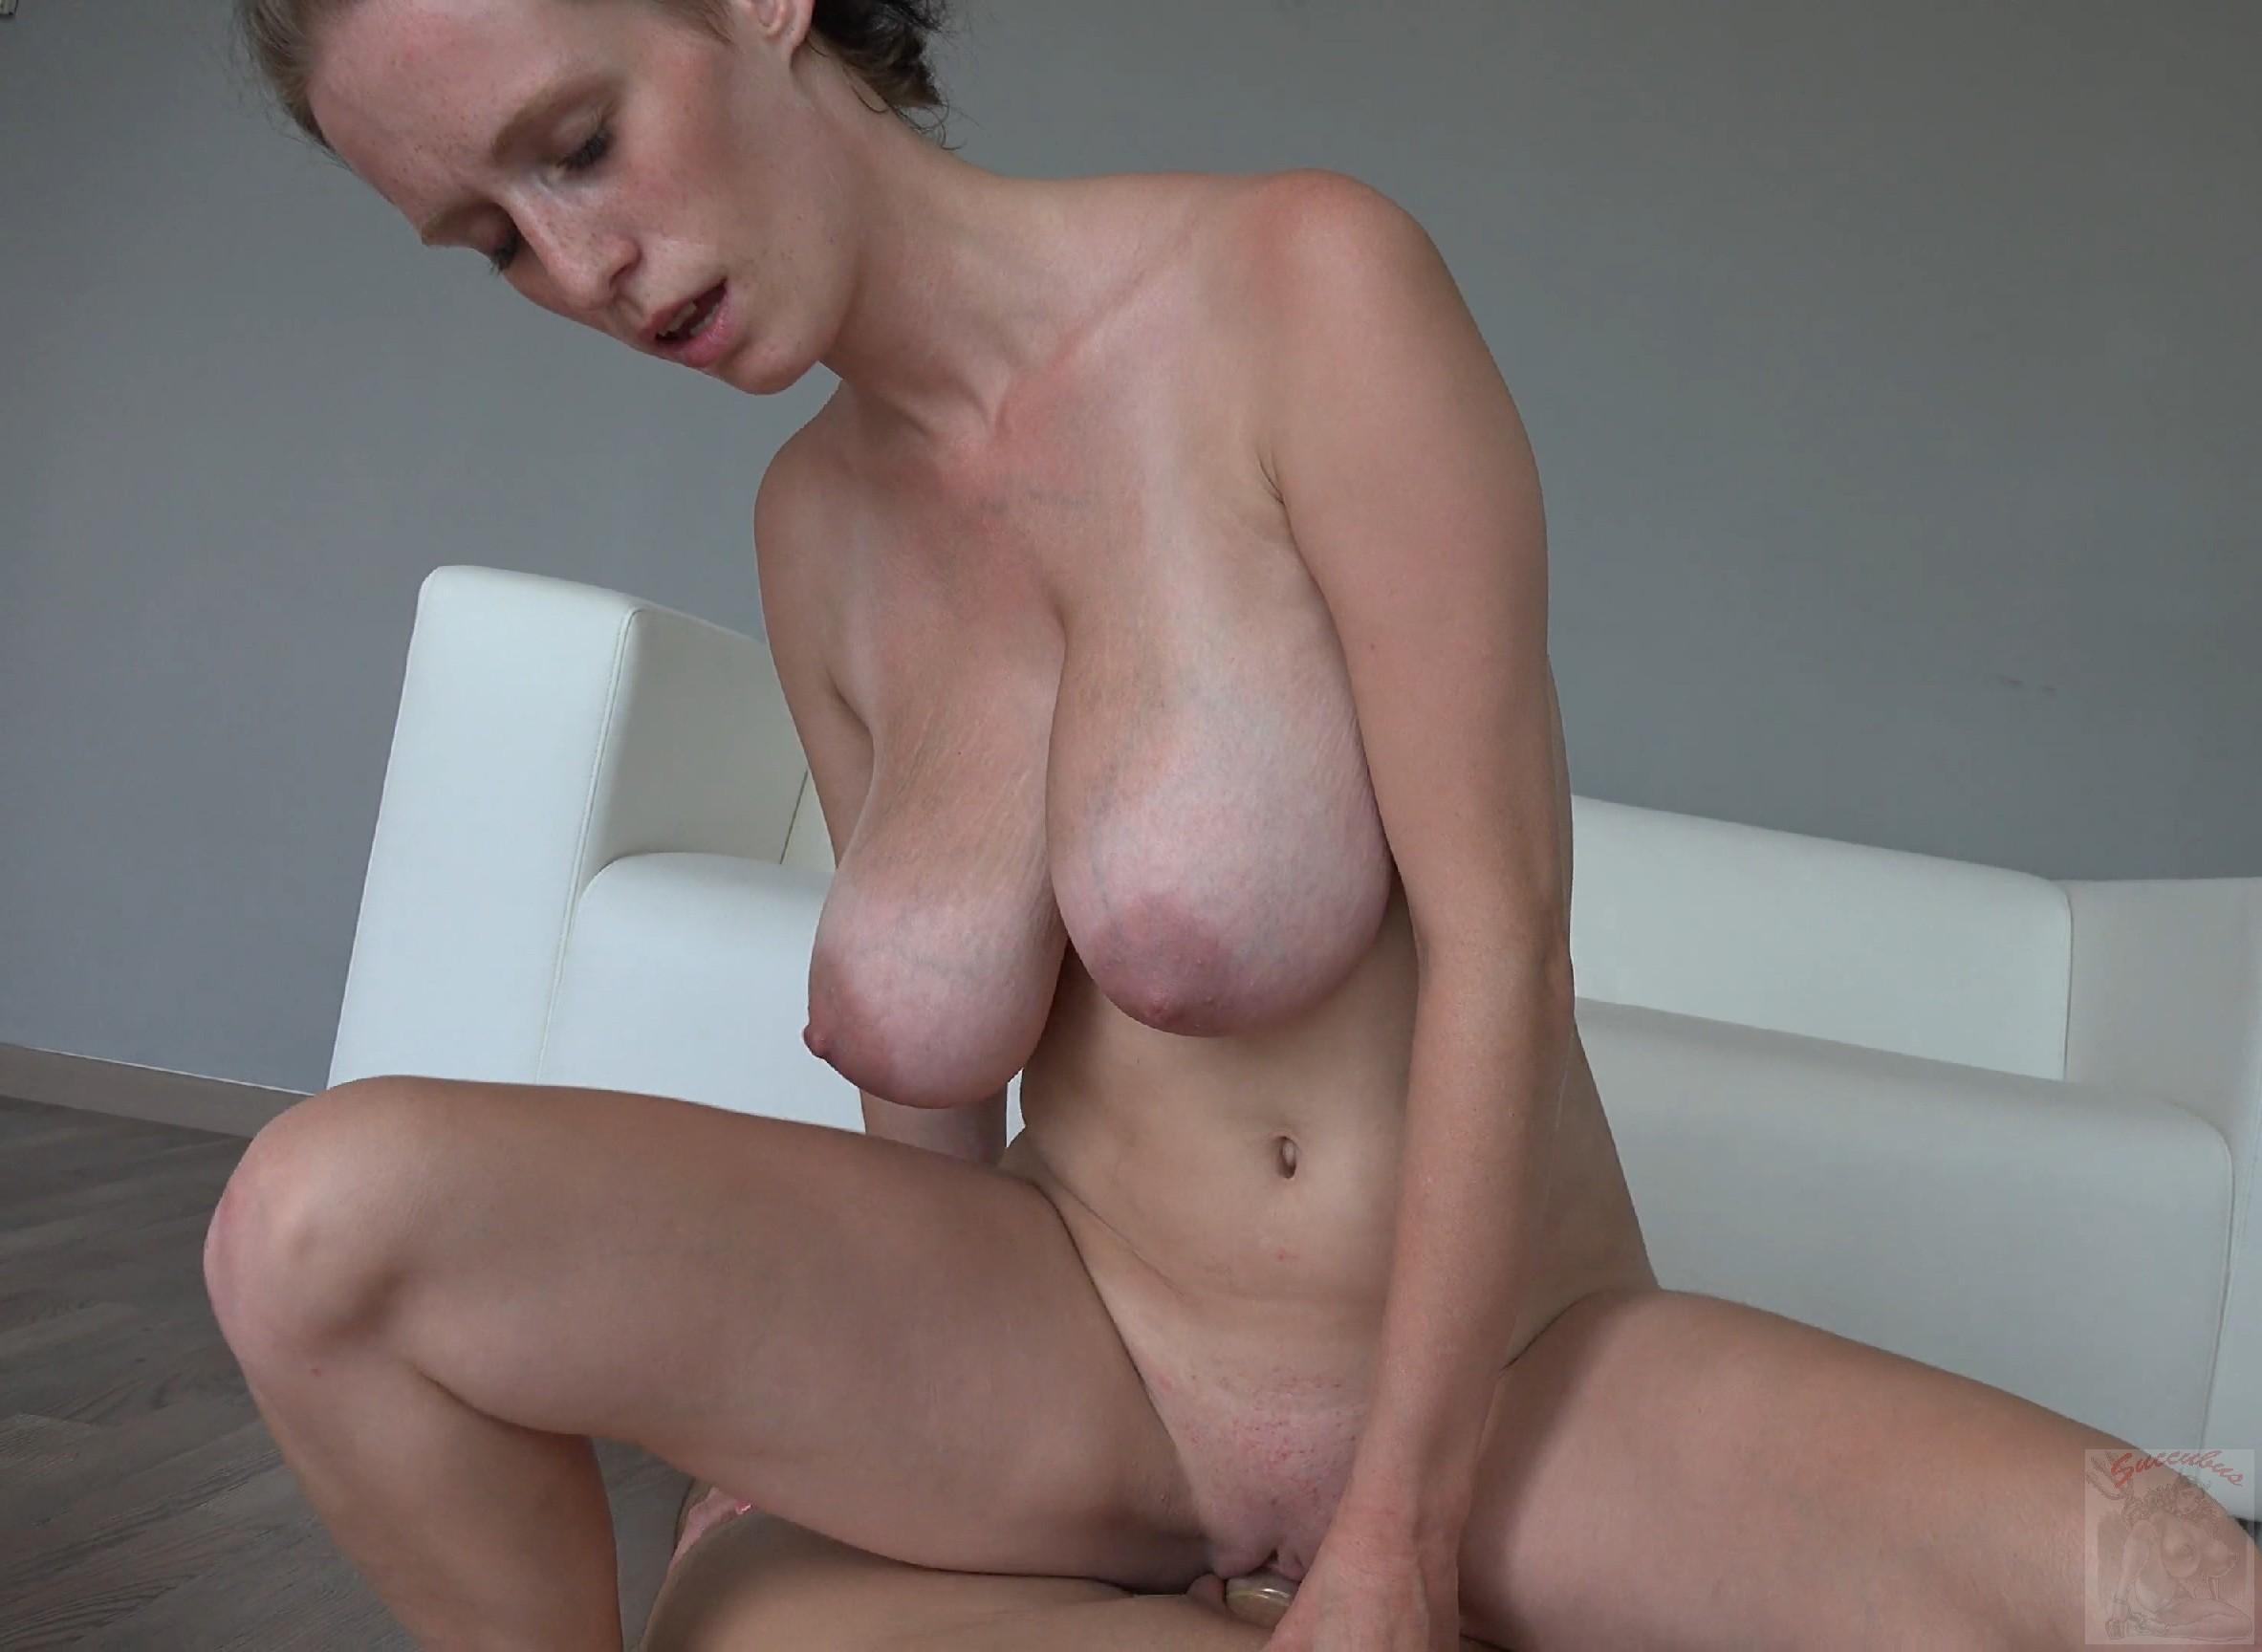 Видео порно видео с висячими сиськами госпоже